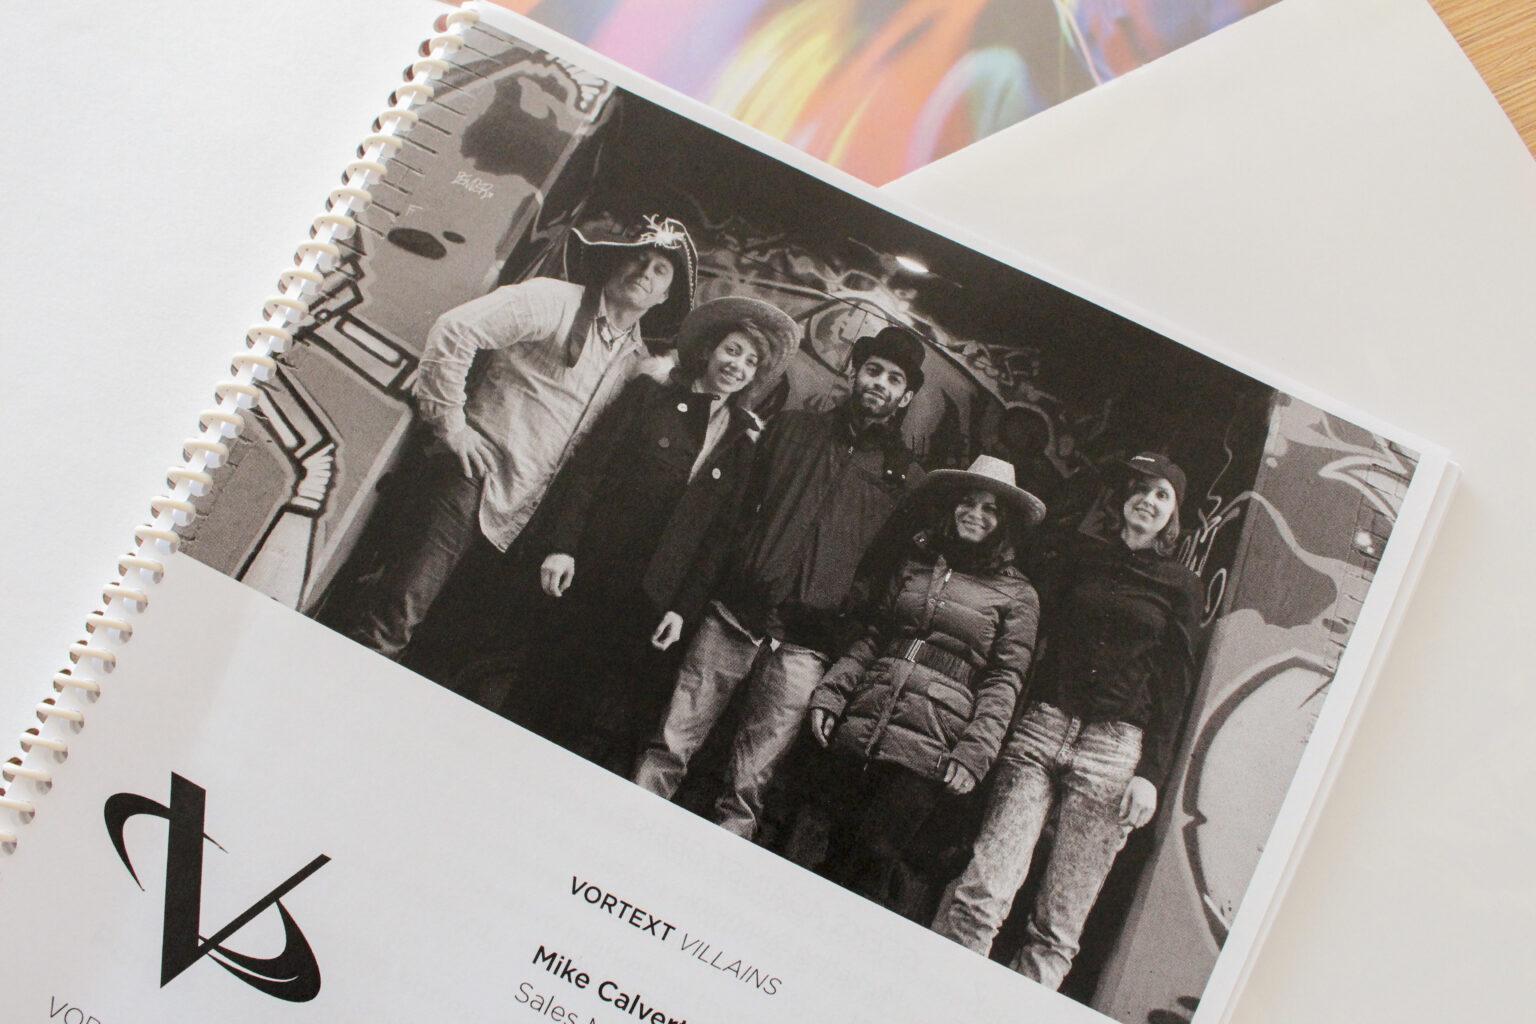 Vortext Press project materials – team photo